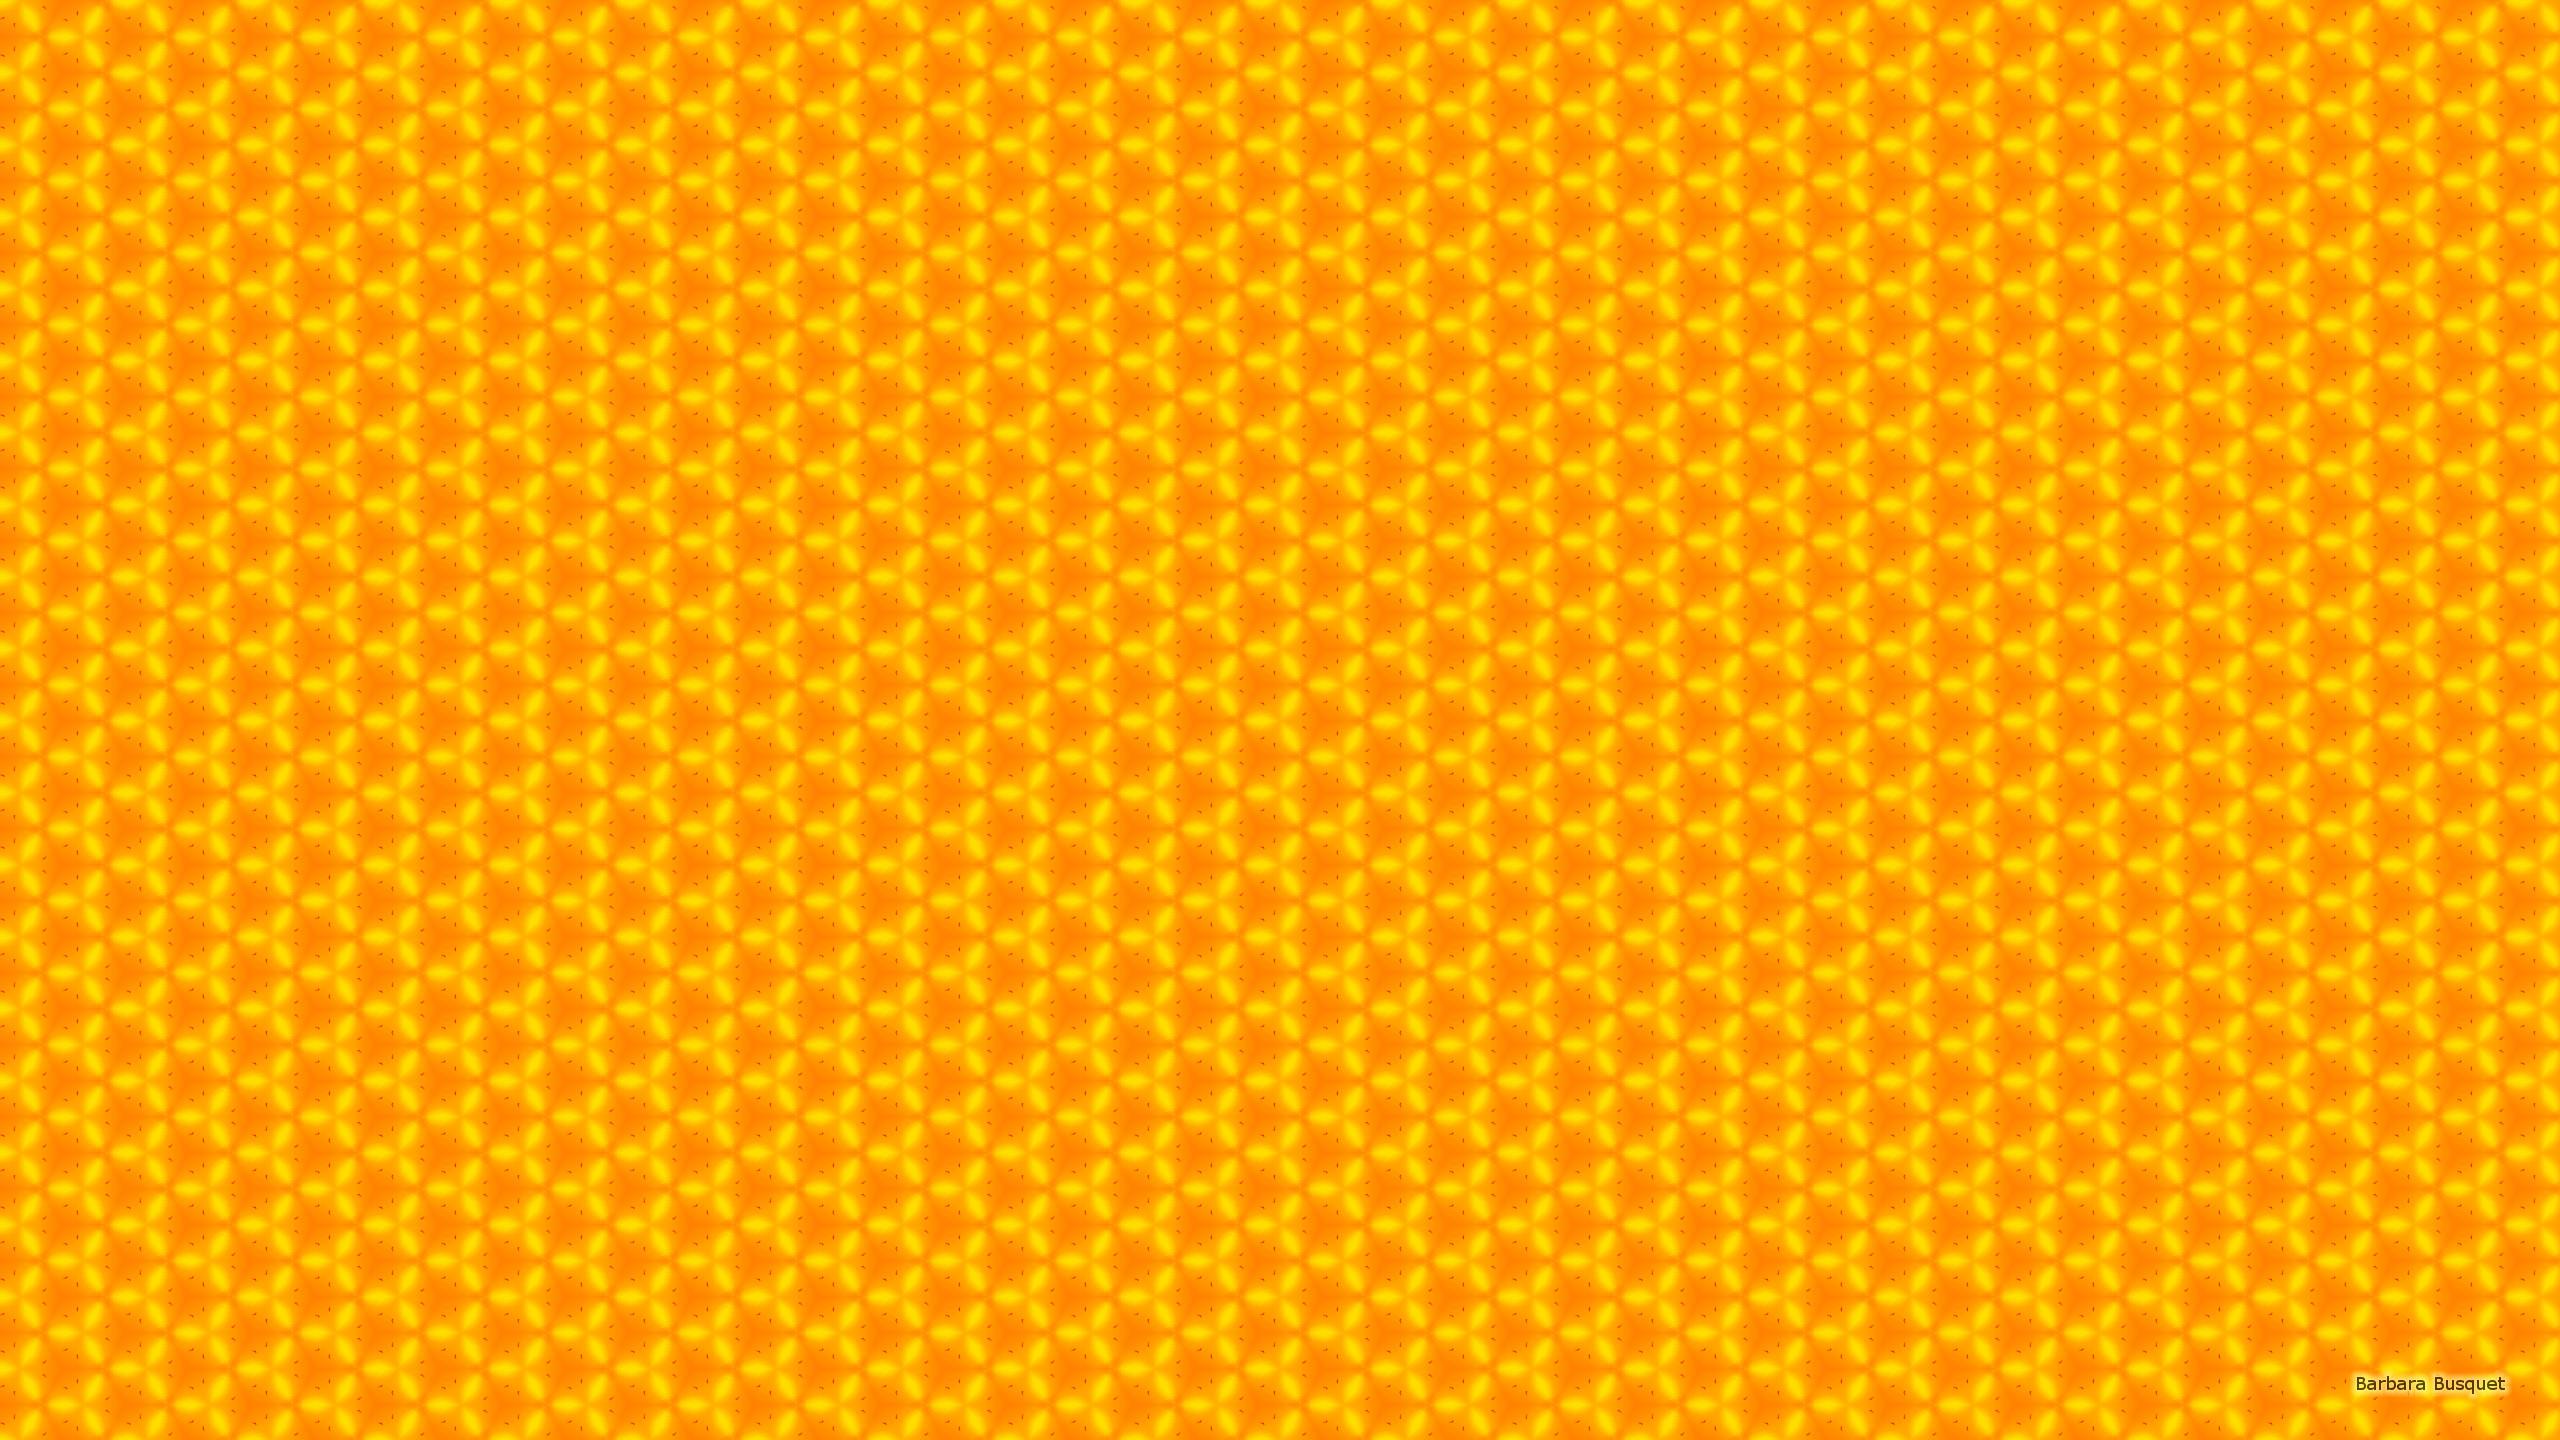 Pattern wallpaper made at sunset 1